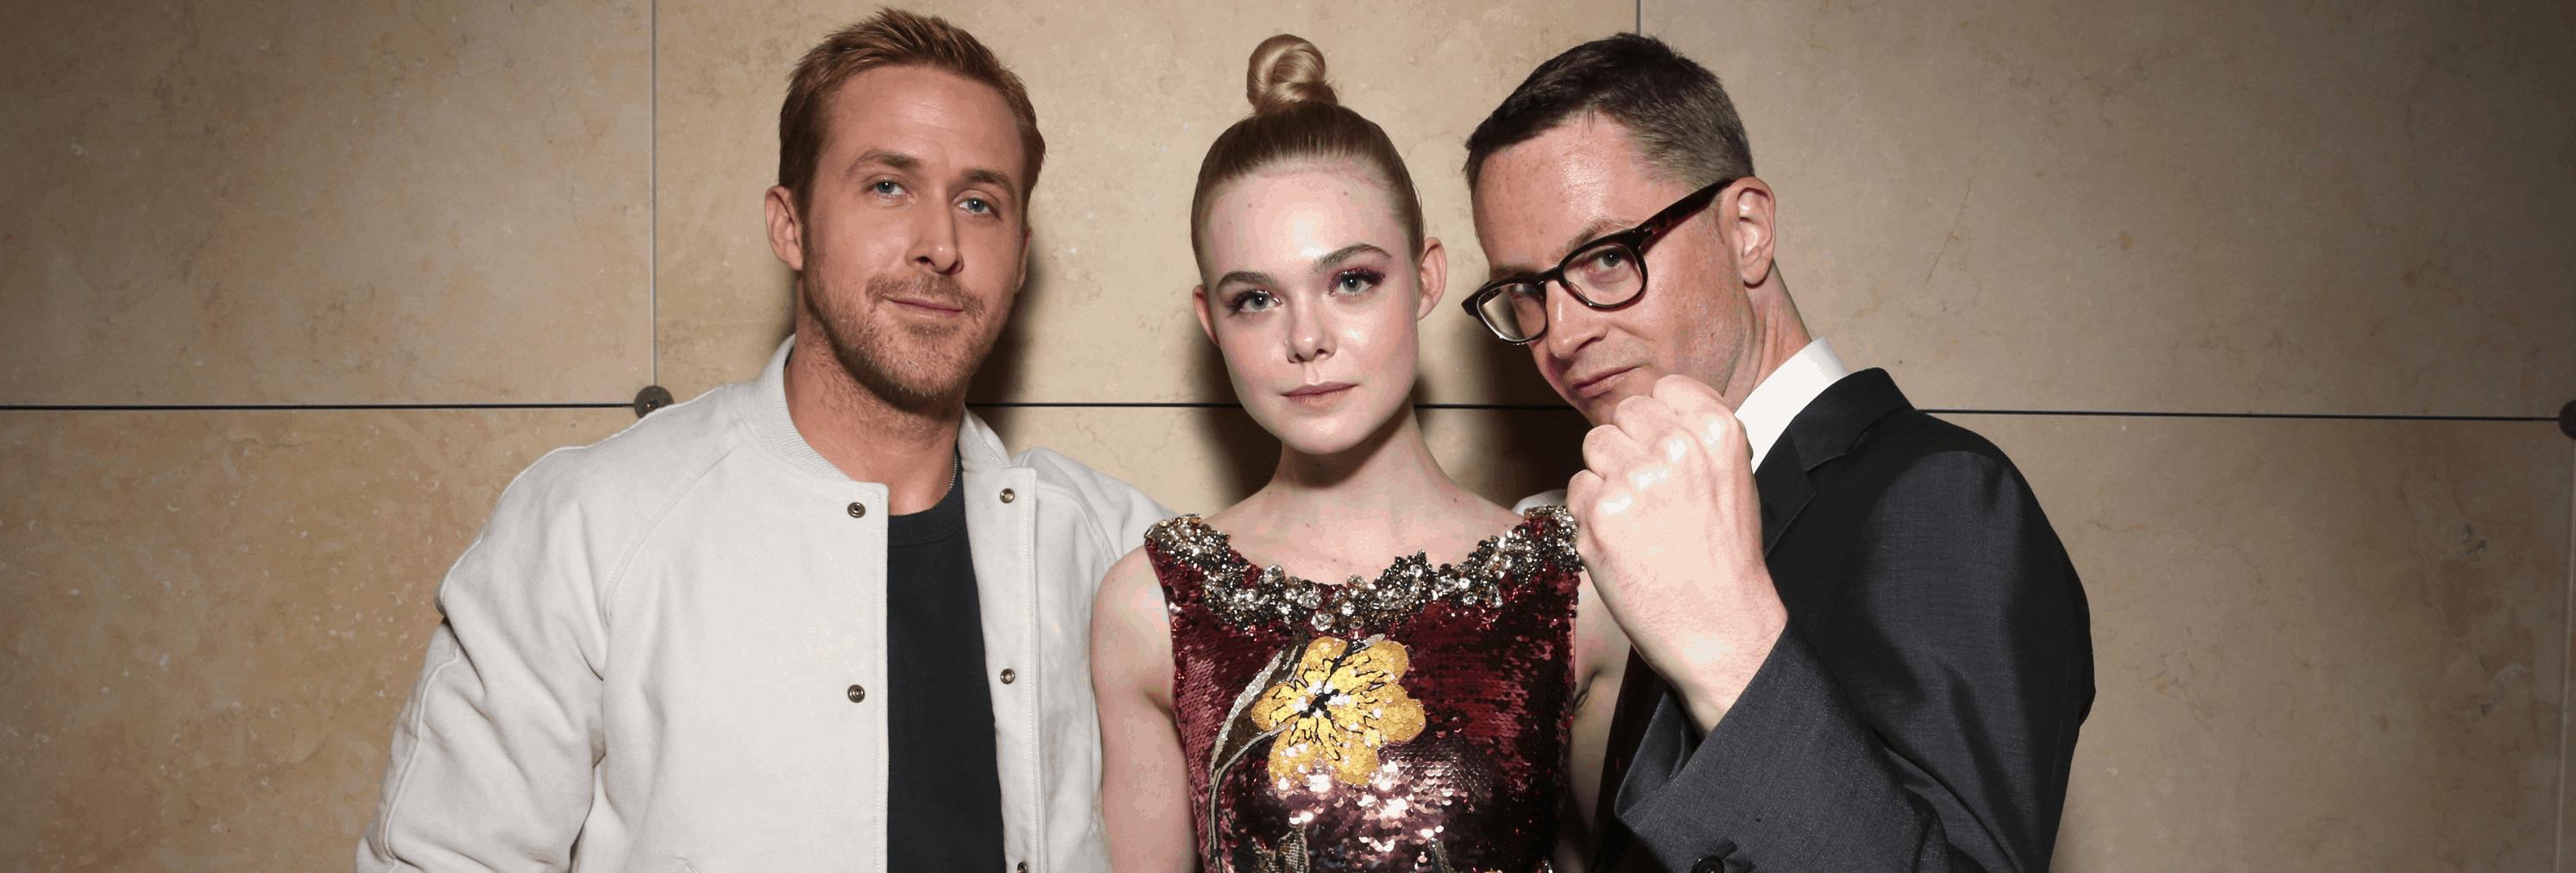 Ryan-Gosling-The-Neon-Demon-Premiere-Los-Angeles-Q&A-2016-008